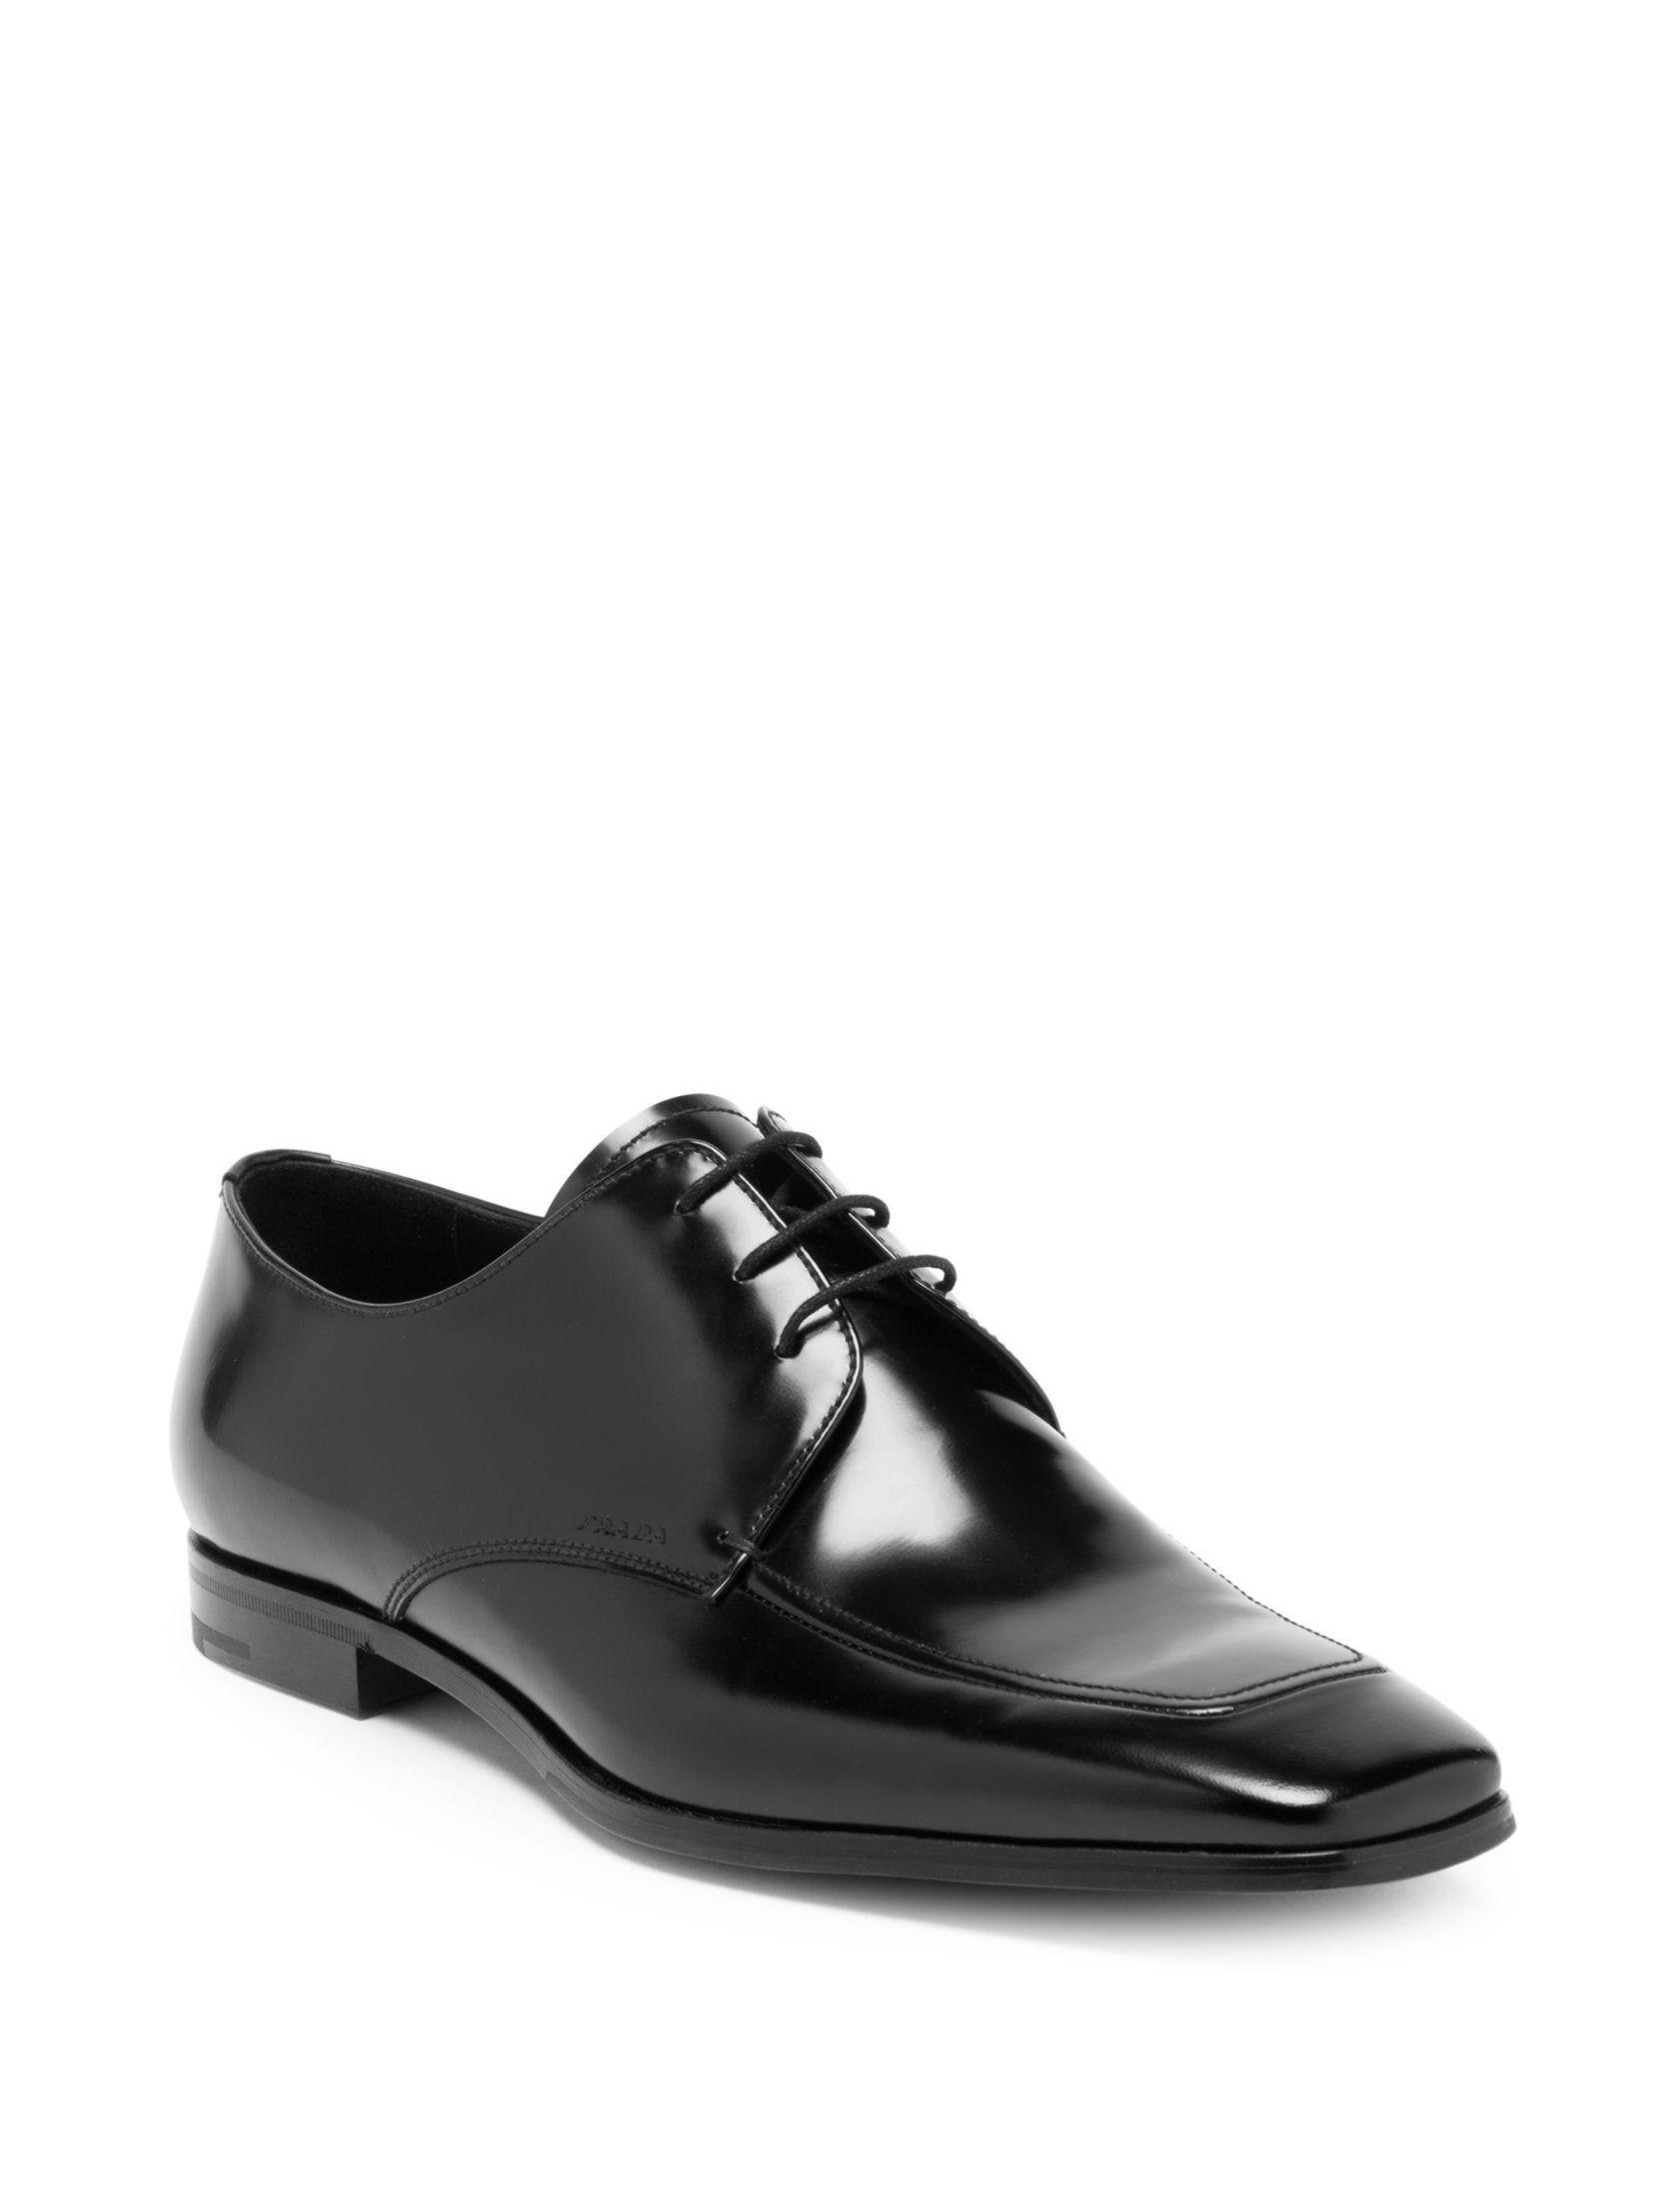 PradaSpazzolato Fume Leather Loafers AX6iqv